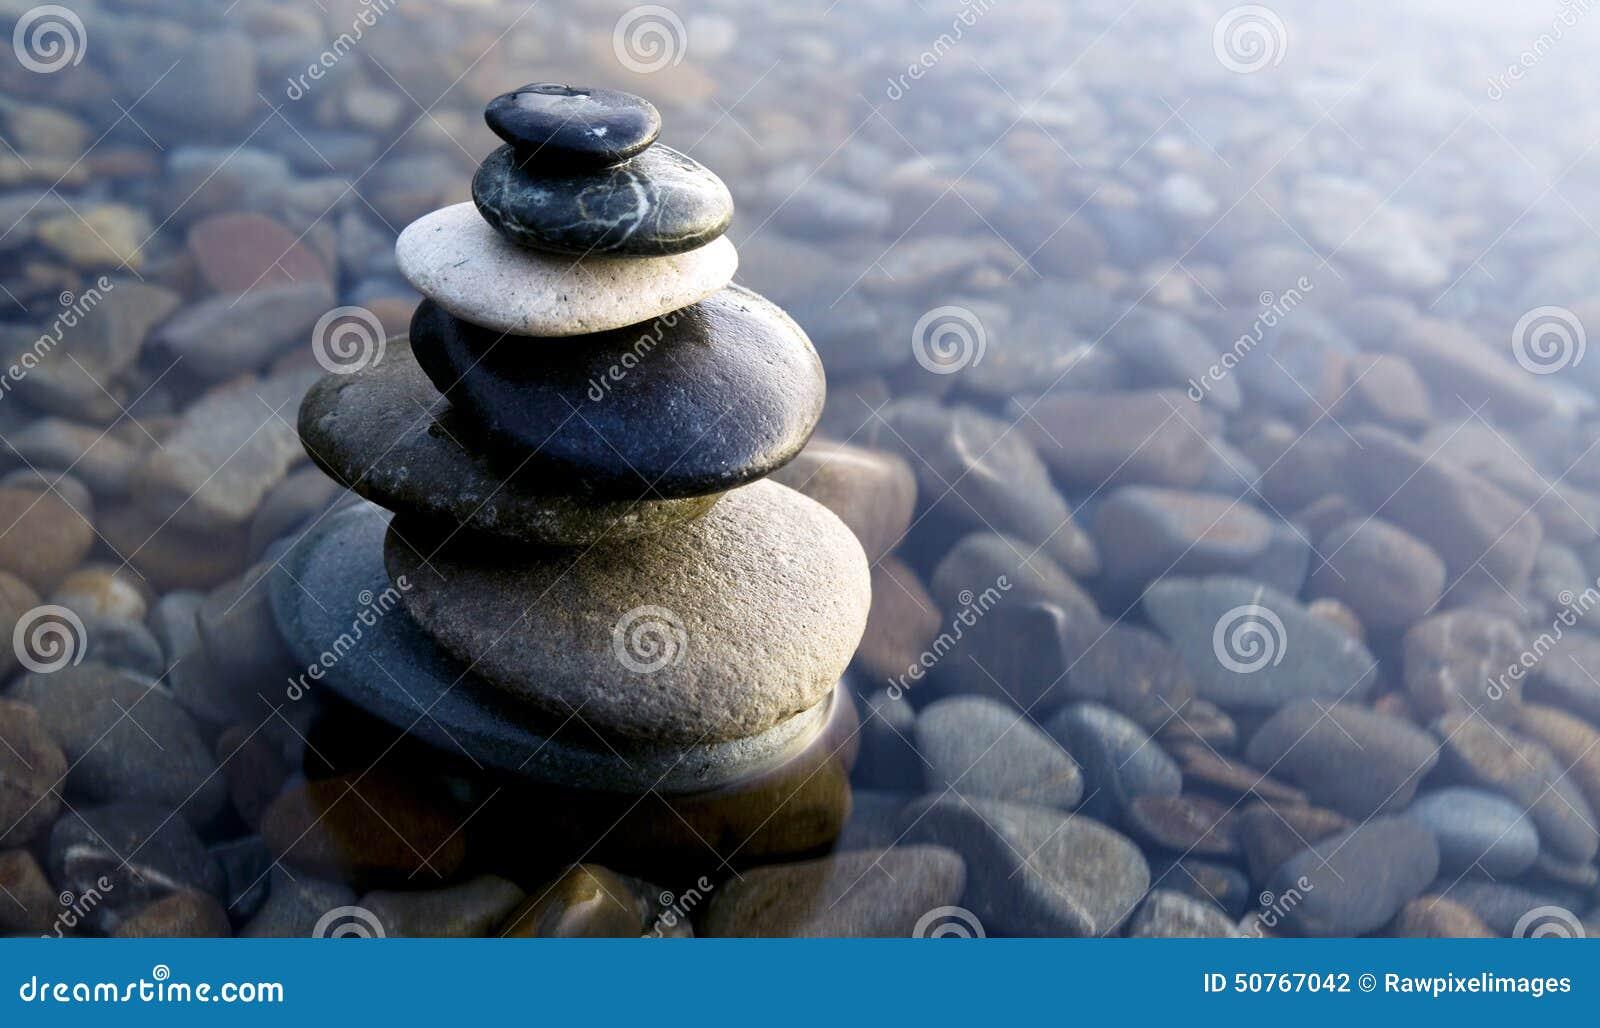 Zen Balancing Rocks Pebbles Covered Water Concept